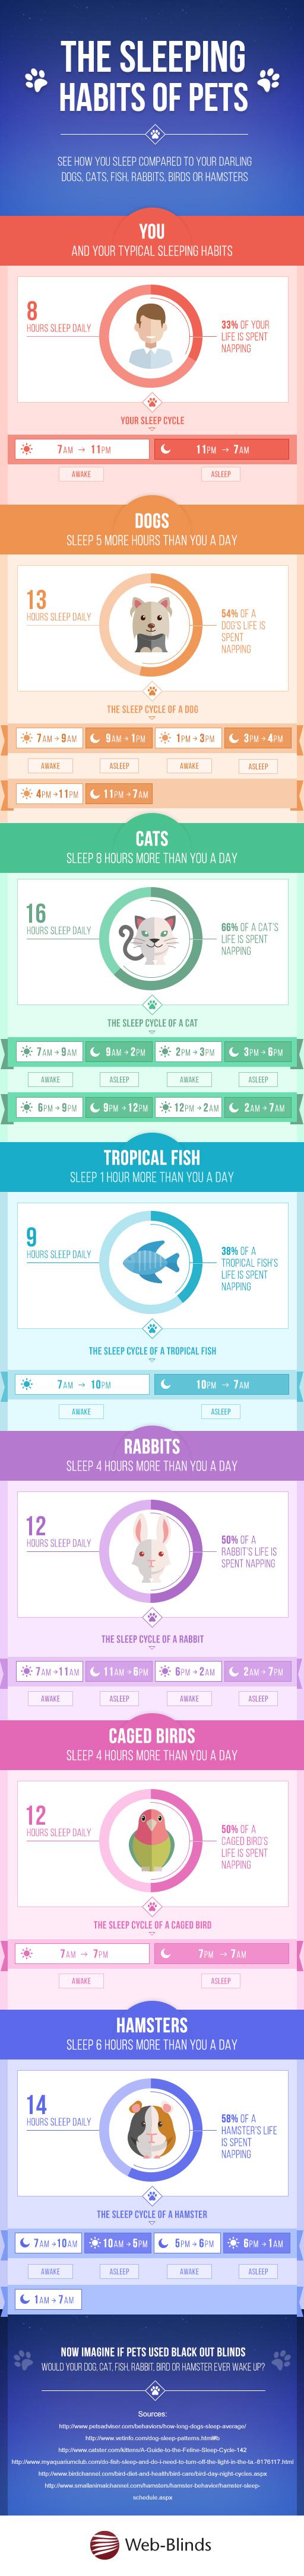 How Much Do Pets Sleep?